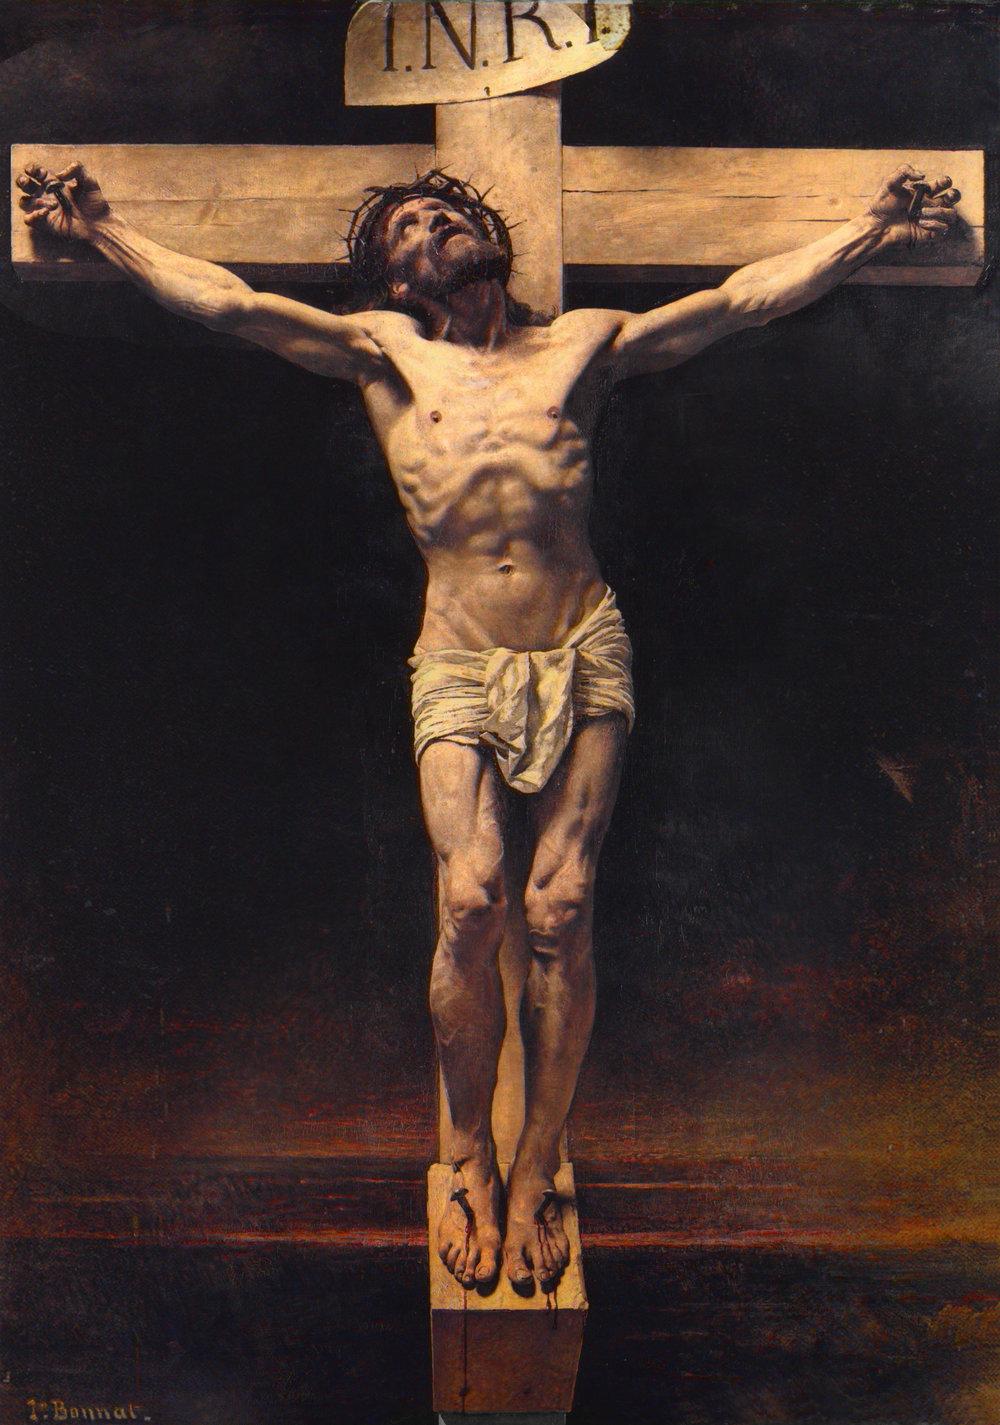 Christ on the Cross, Leon Bonnat, oil on canvas, 1874